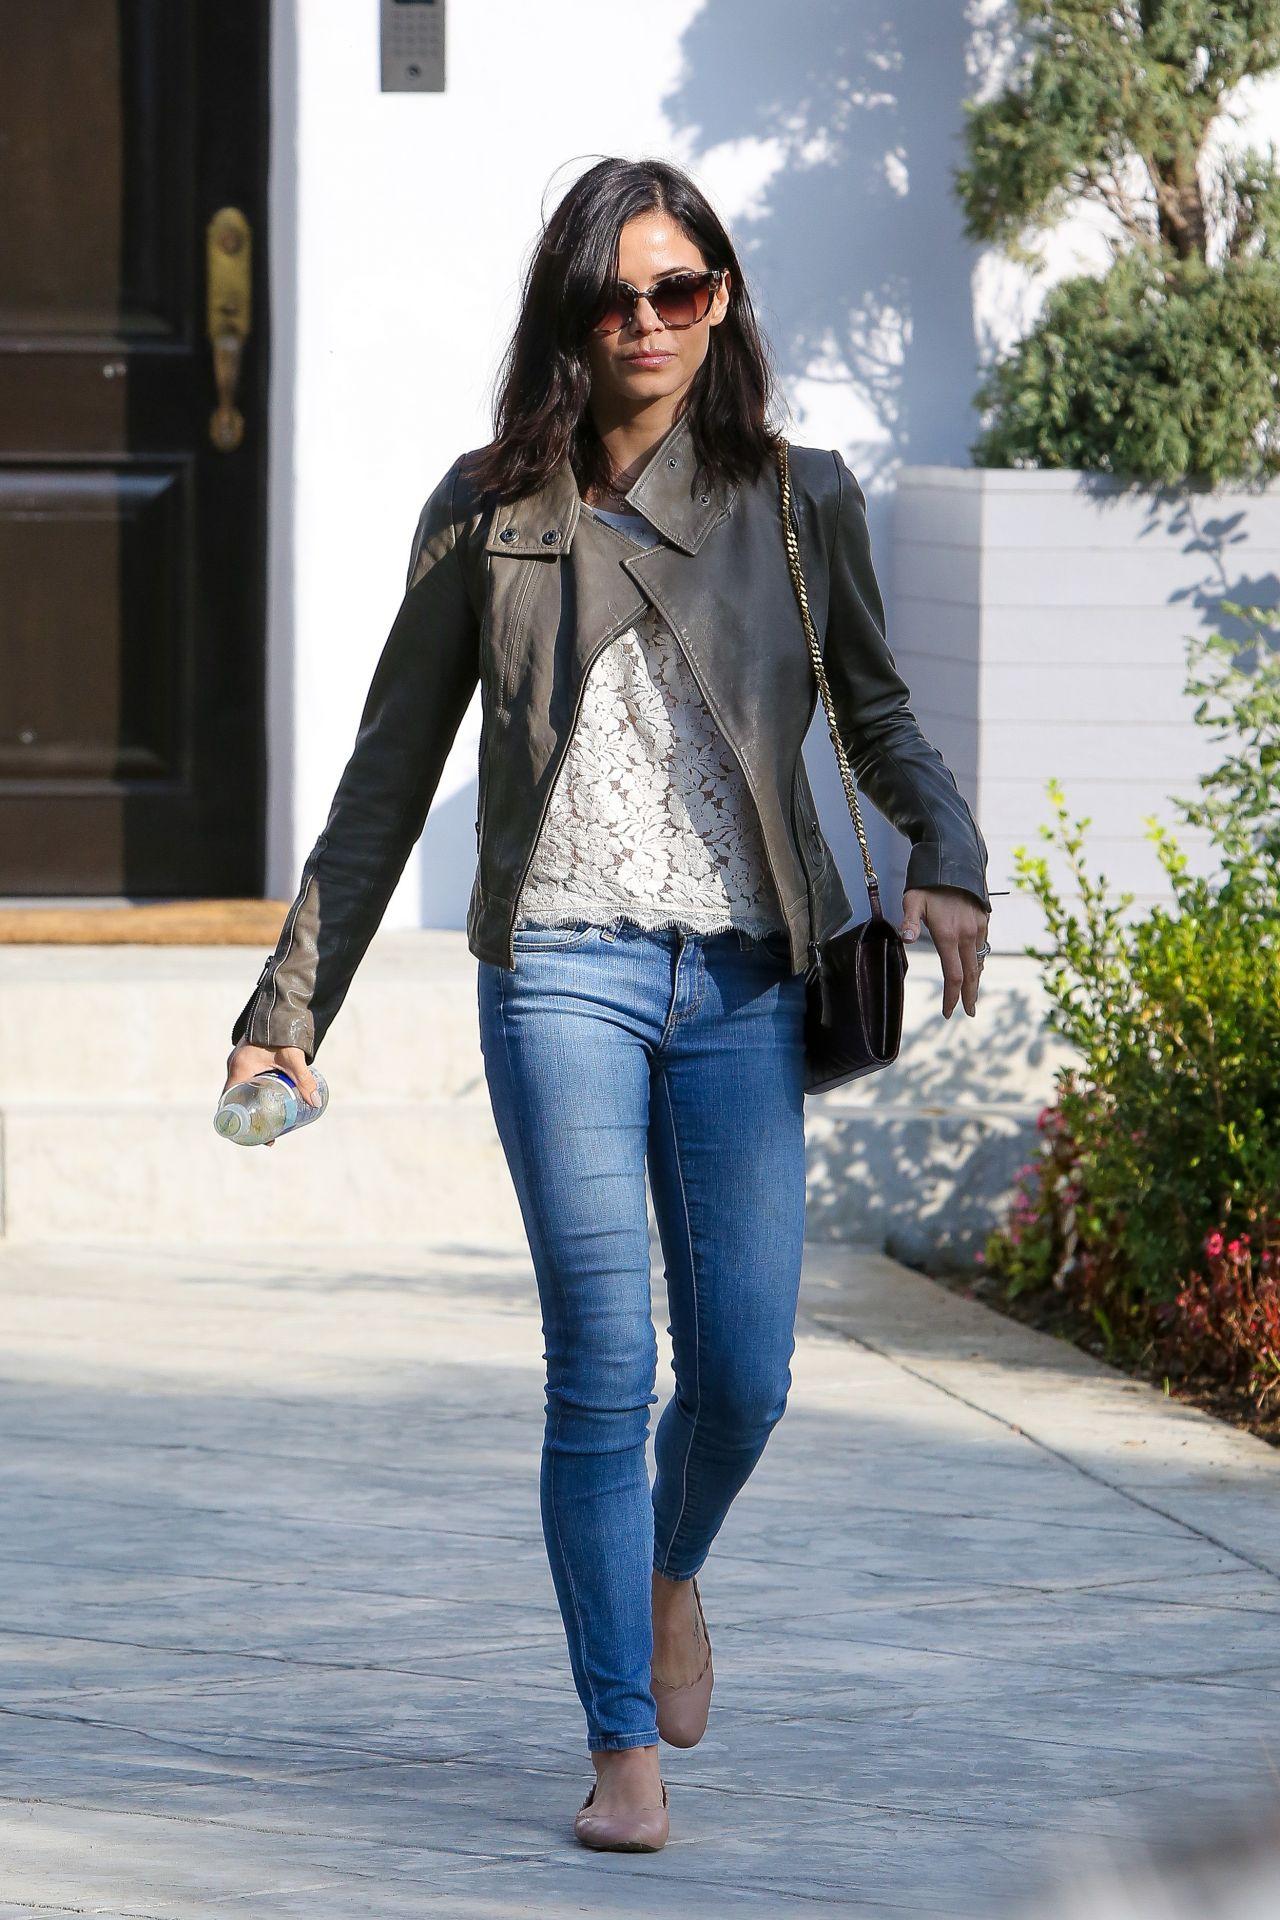 Jenna Dewan In Jeans Leaving A House In Beverly Hills